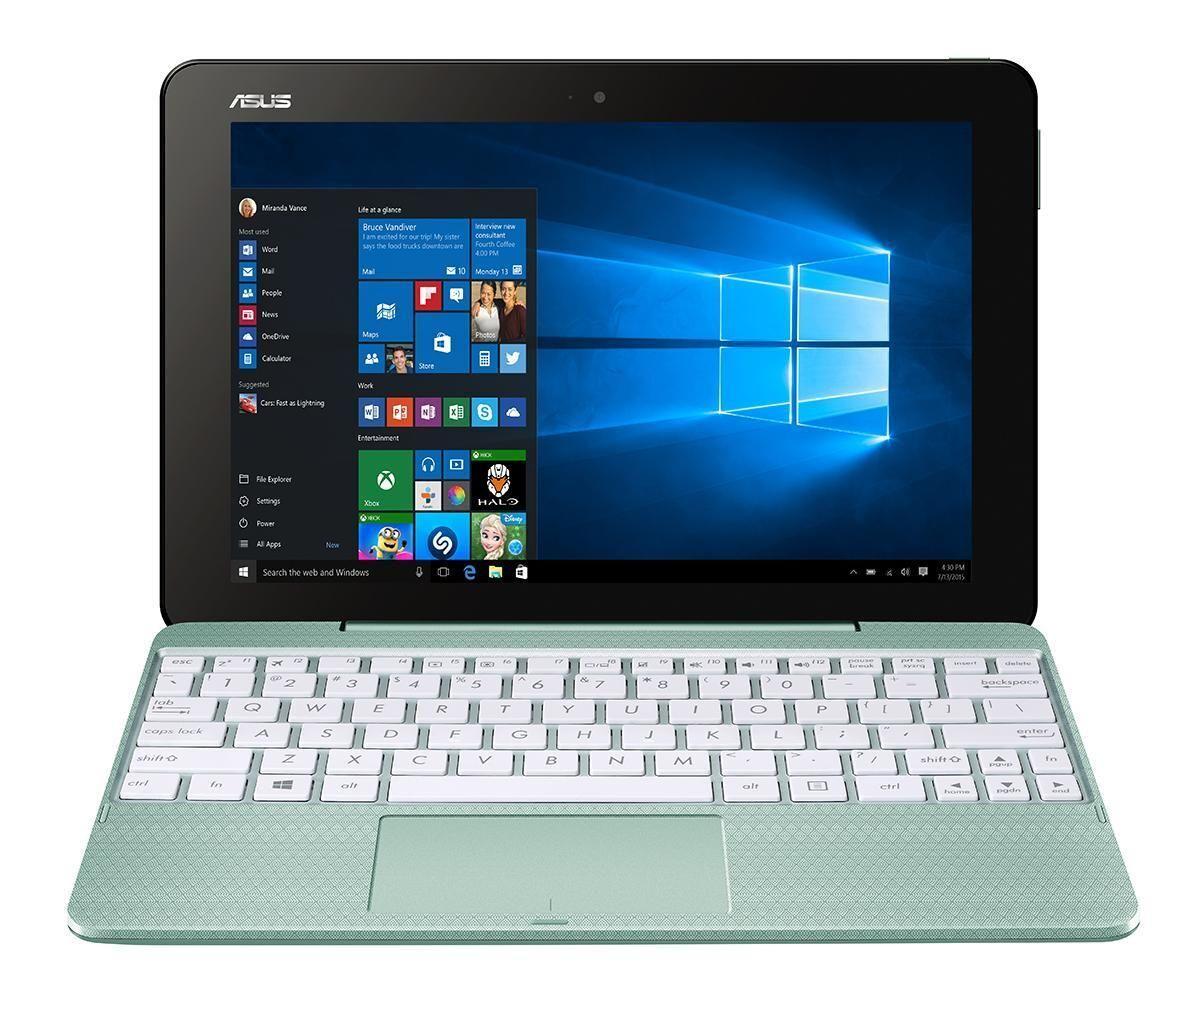 Asus Transformer Book T101HA-GR060T M-Touch 2in1 Z8350 4Gb Hd 64Gb eMMC Windows 10 Mint